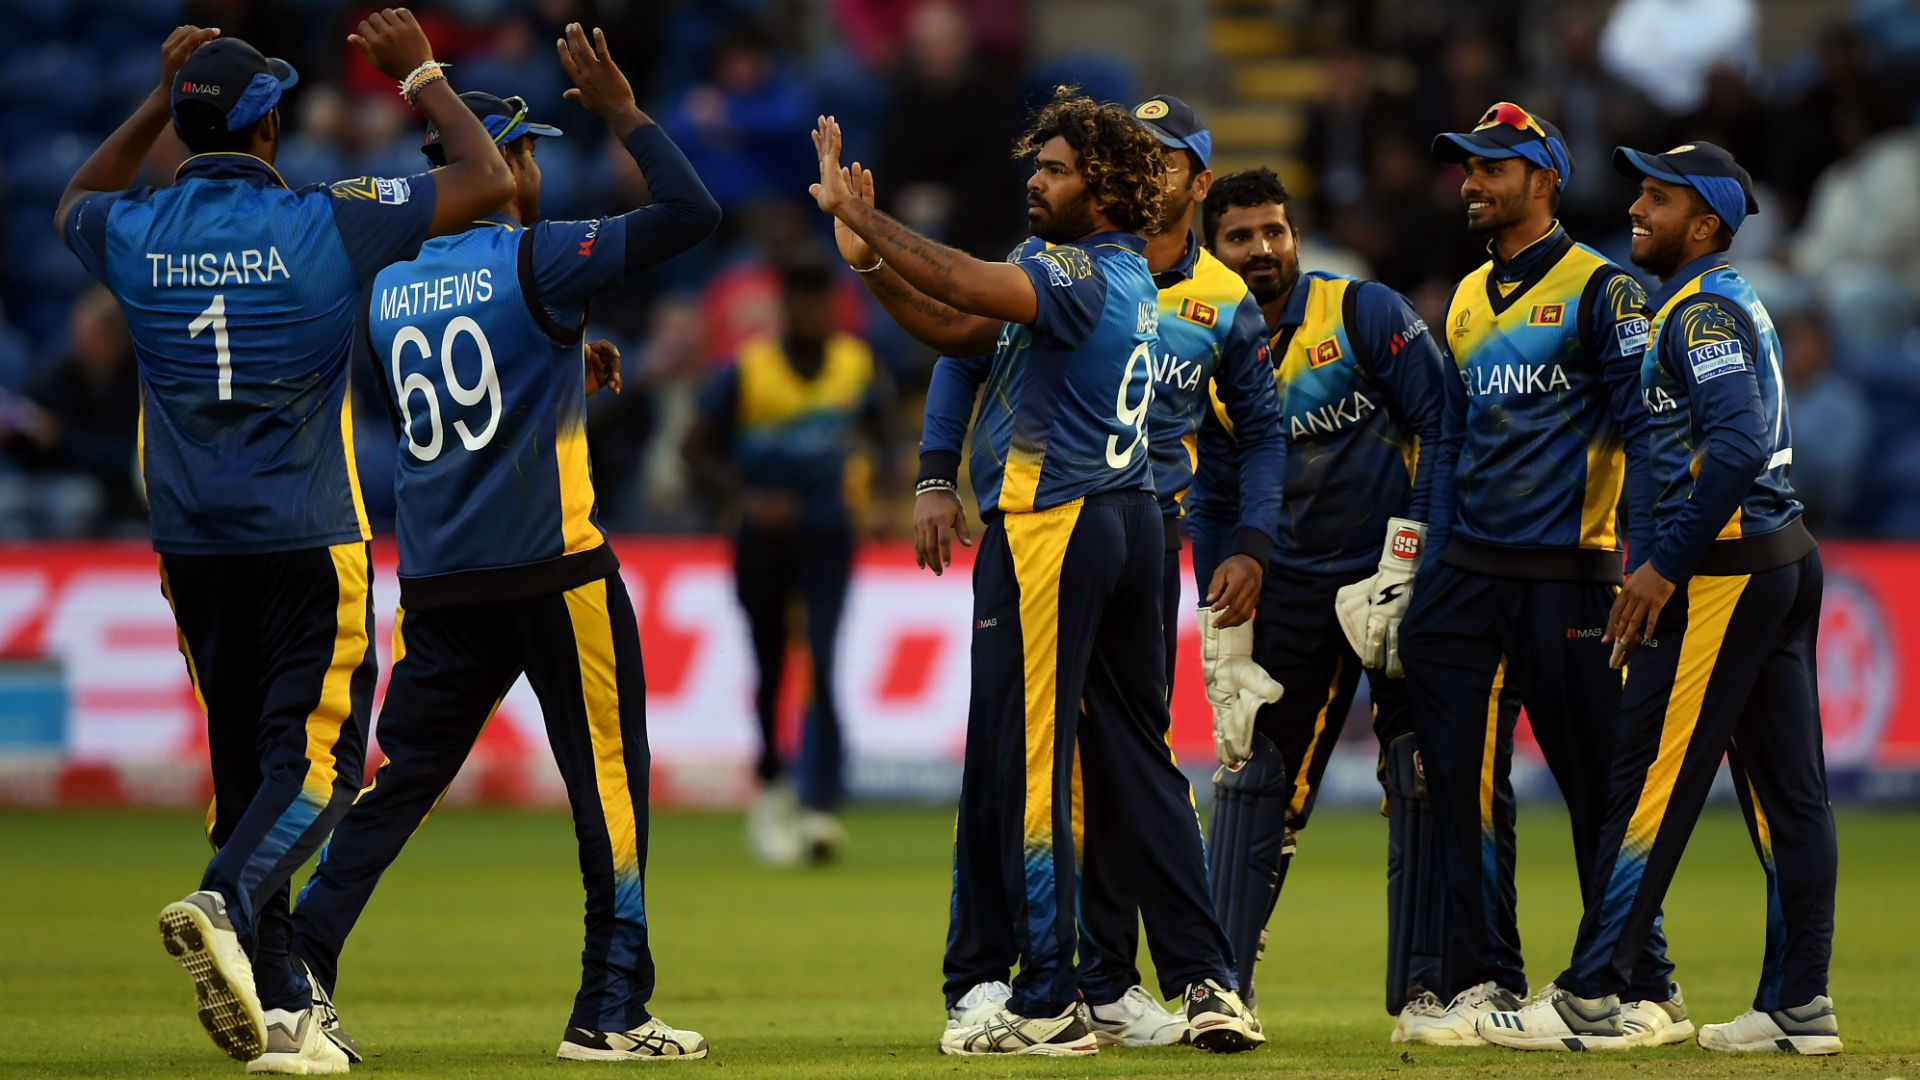 Sri Lanka v Australia: Lions seek upset after washout woe